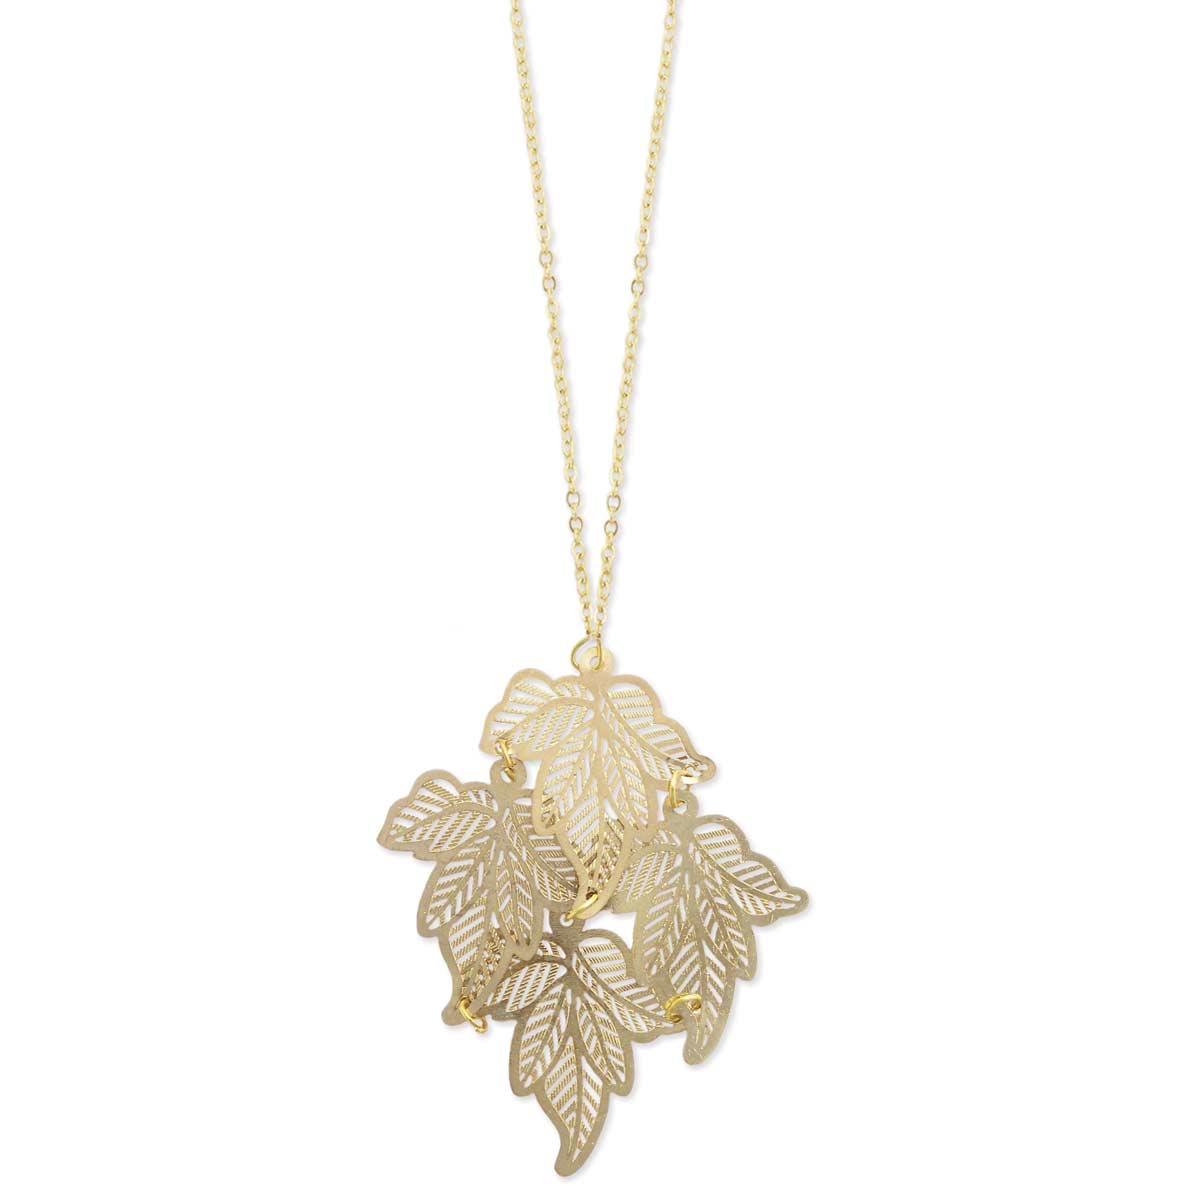 Filigree Gold Leaves Pendant Necklace